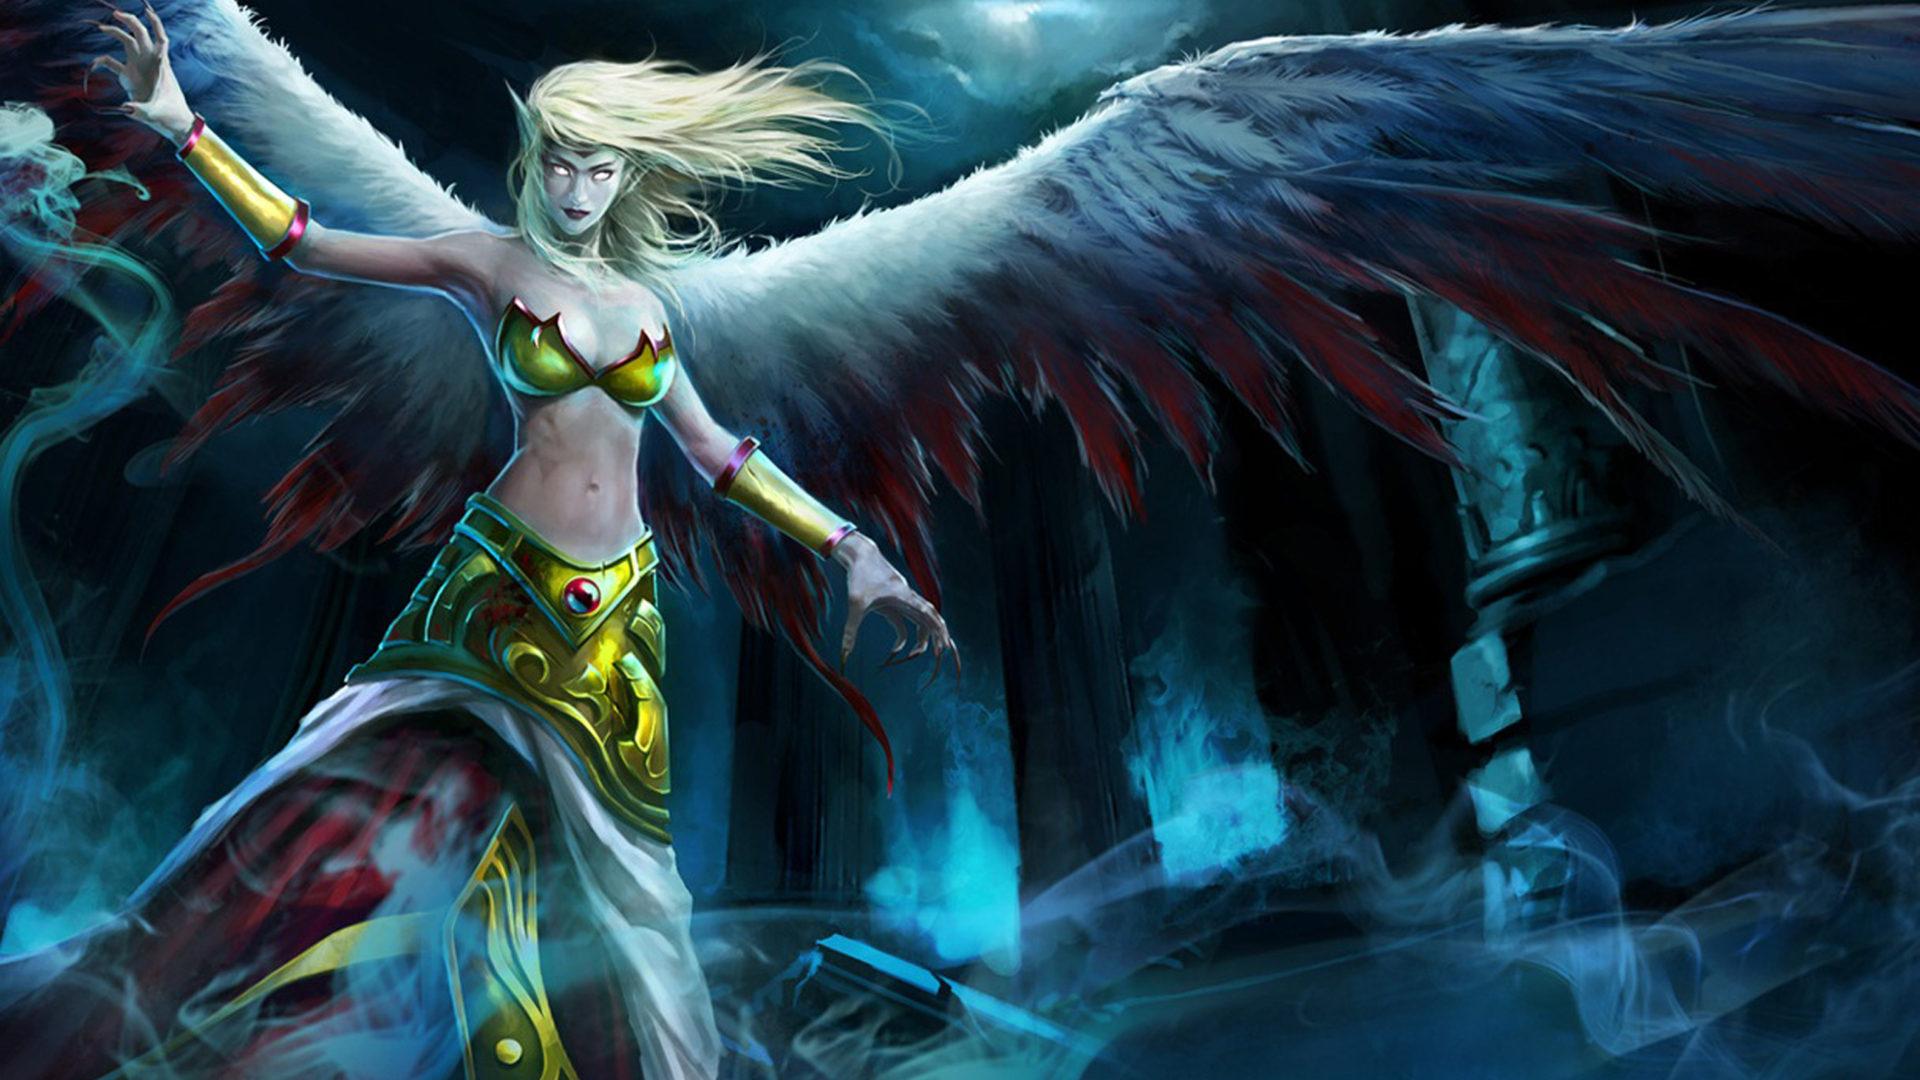 League Of Legends Iphone X Wallpaper League Of Legends Video Games Fallen Angel Exiled Morgana